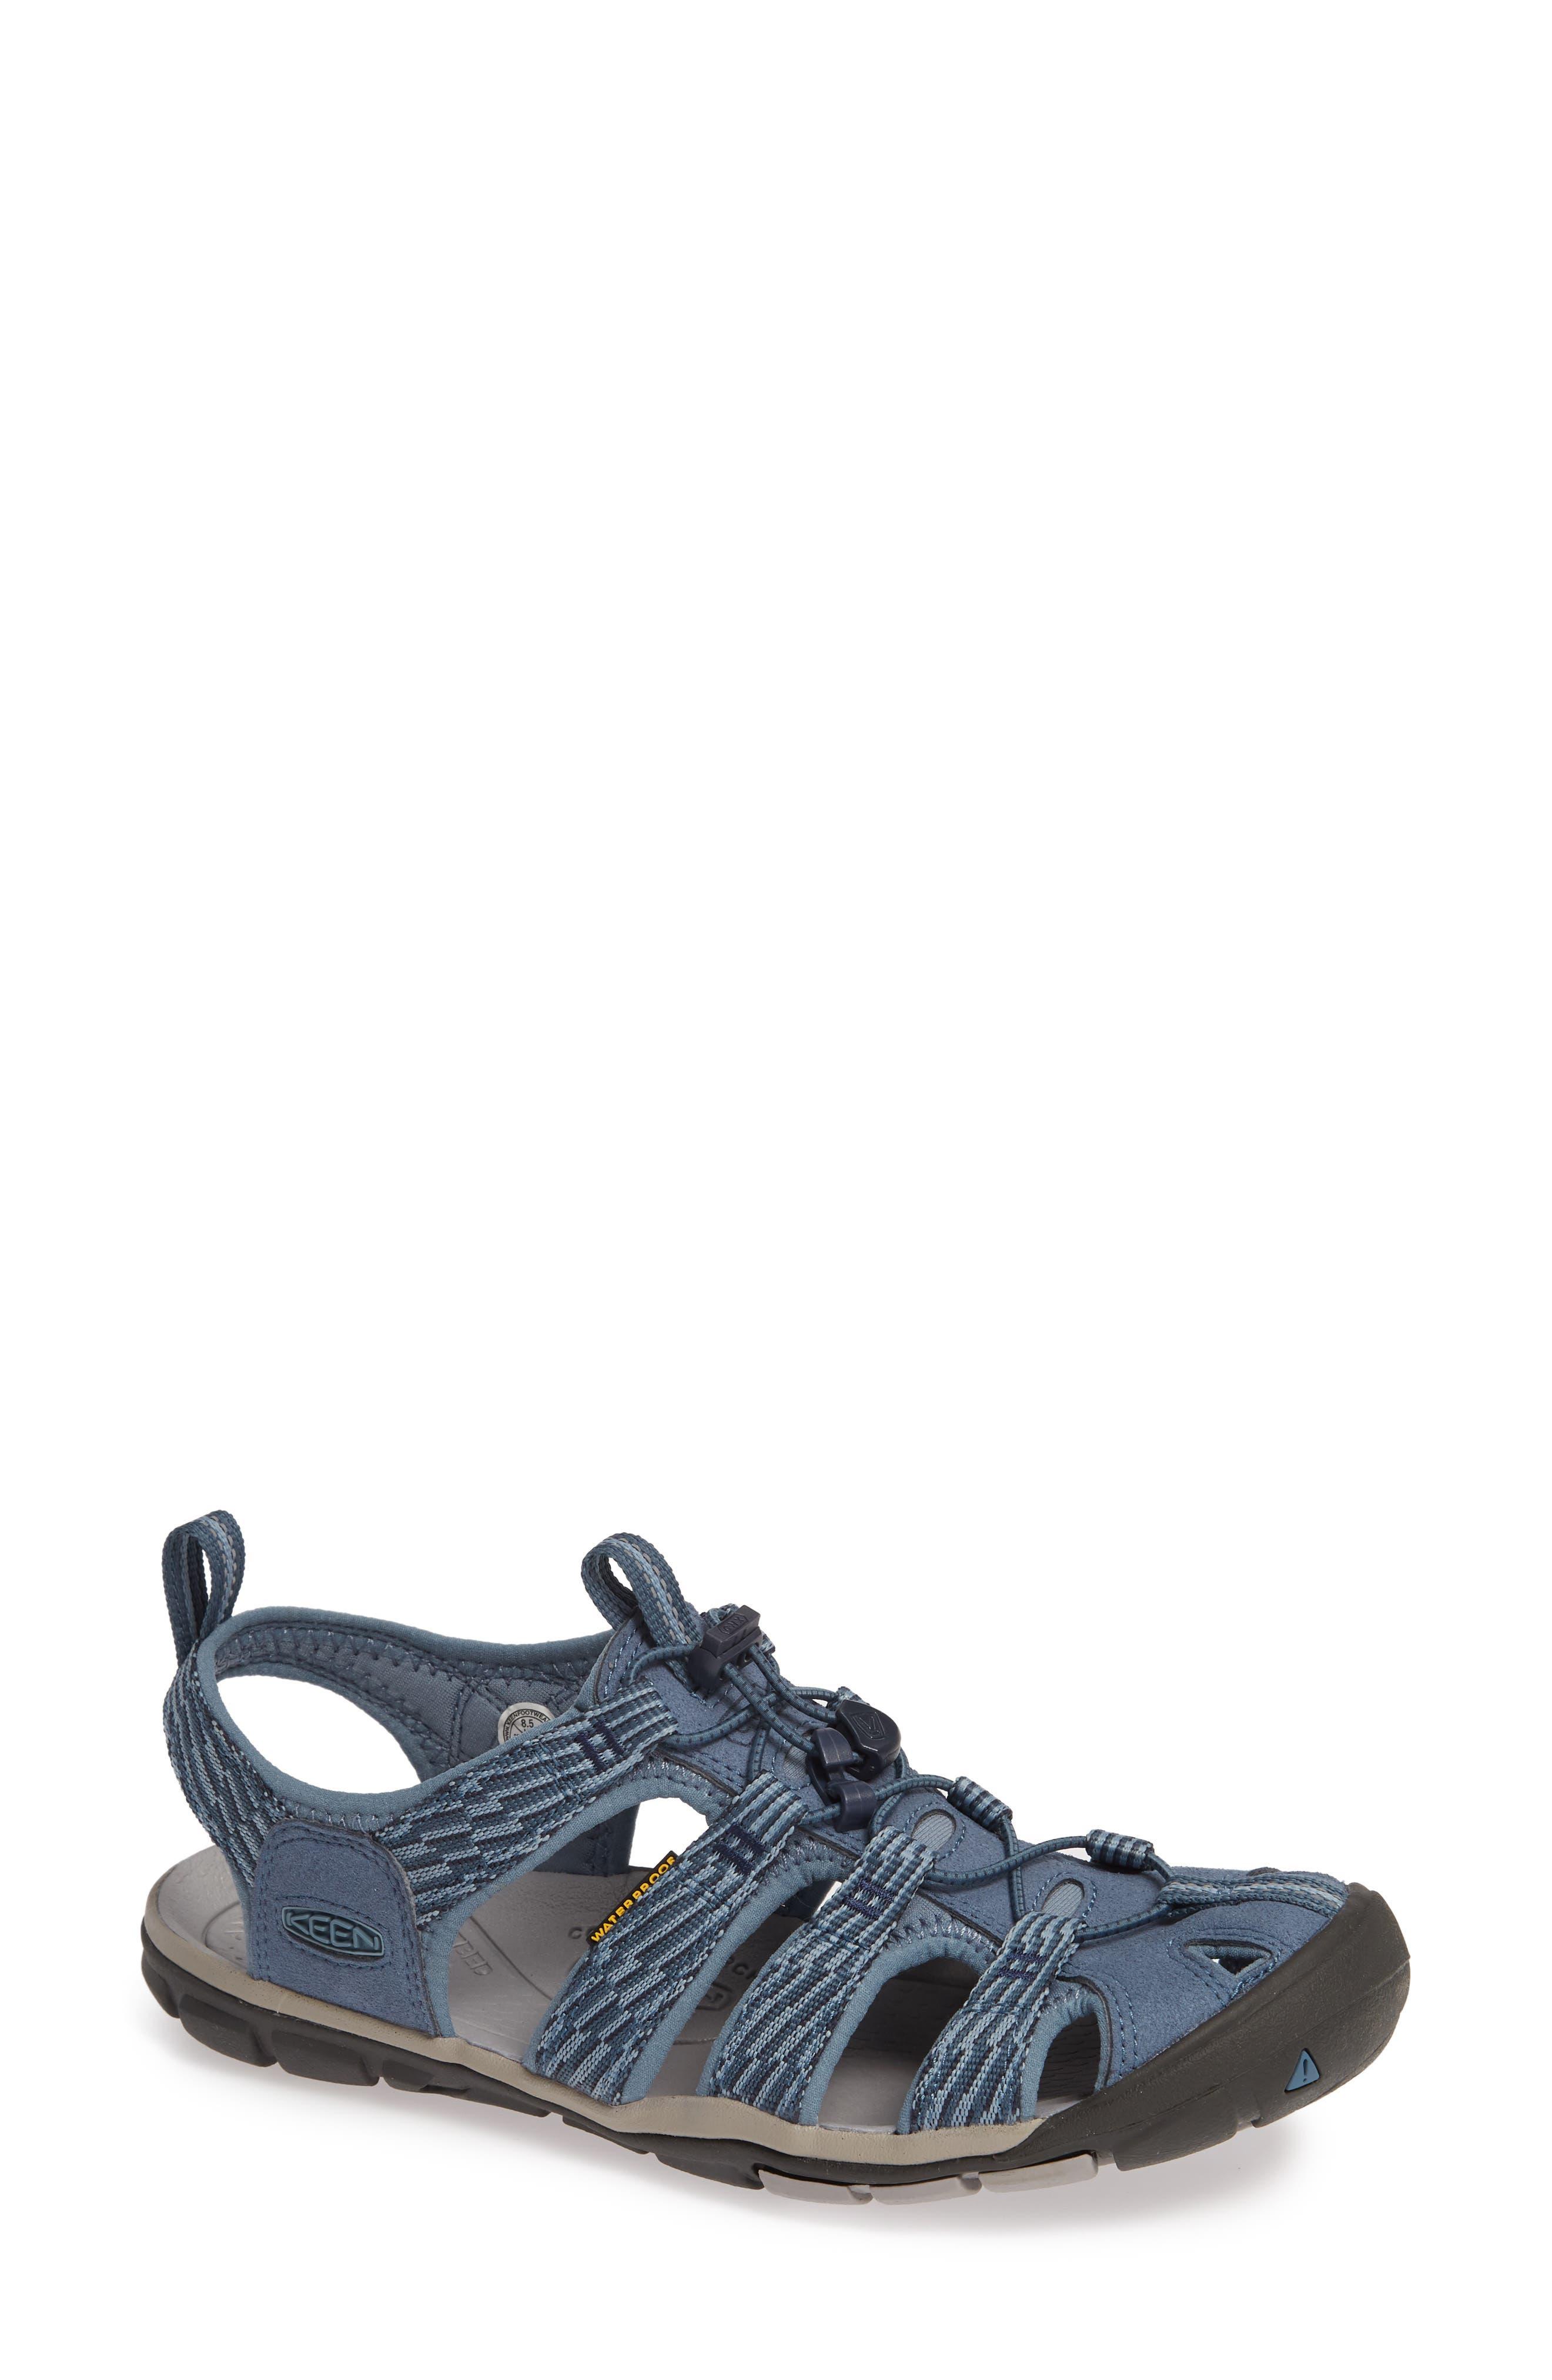 7a284a620206 Women s Fisherman Sandals